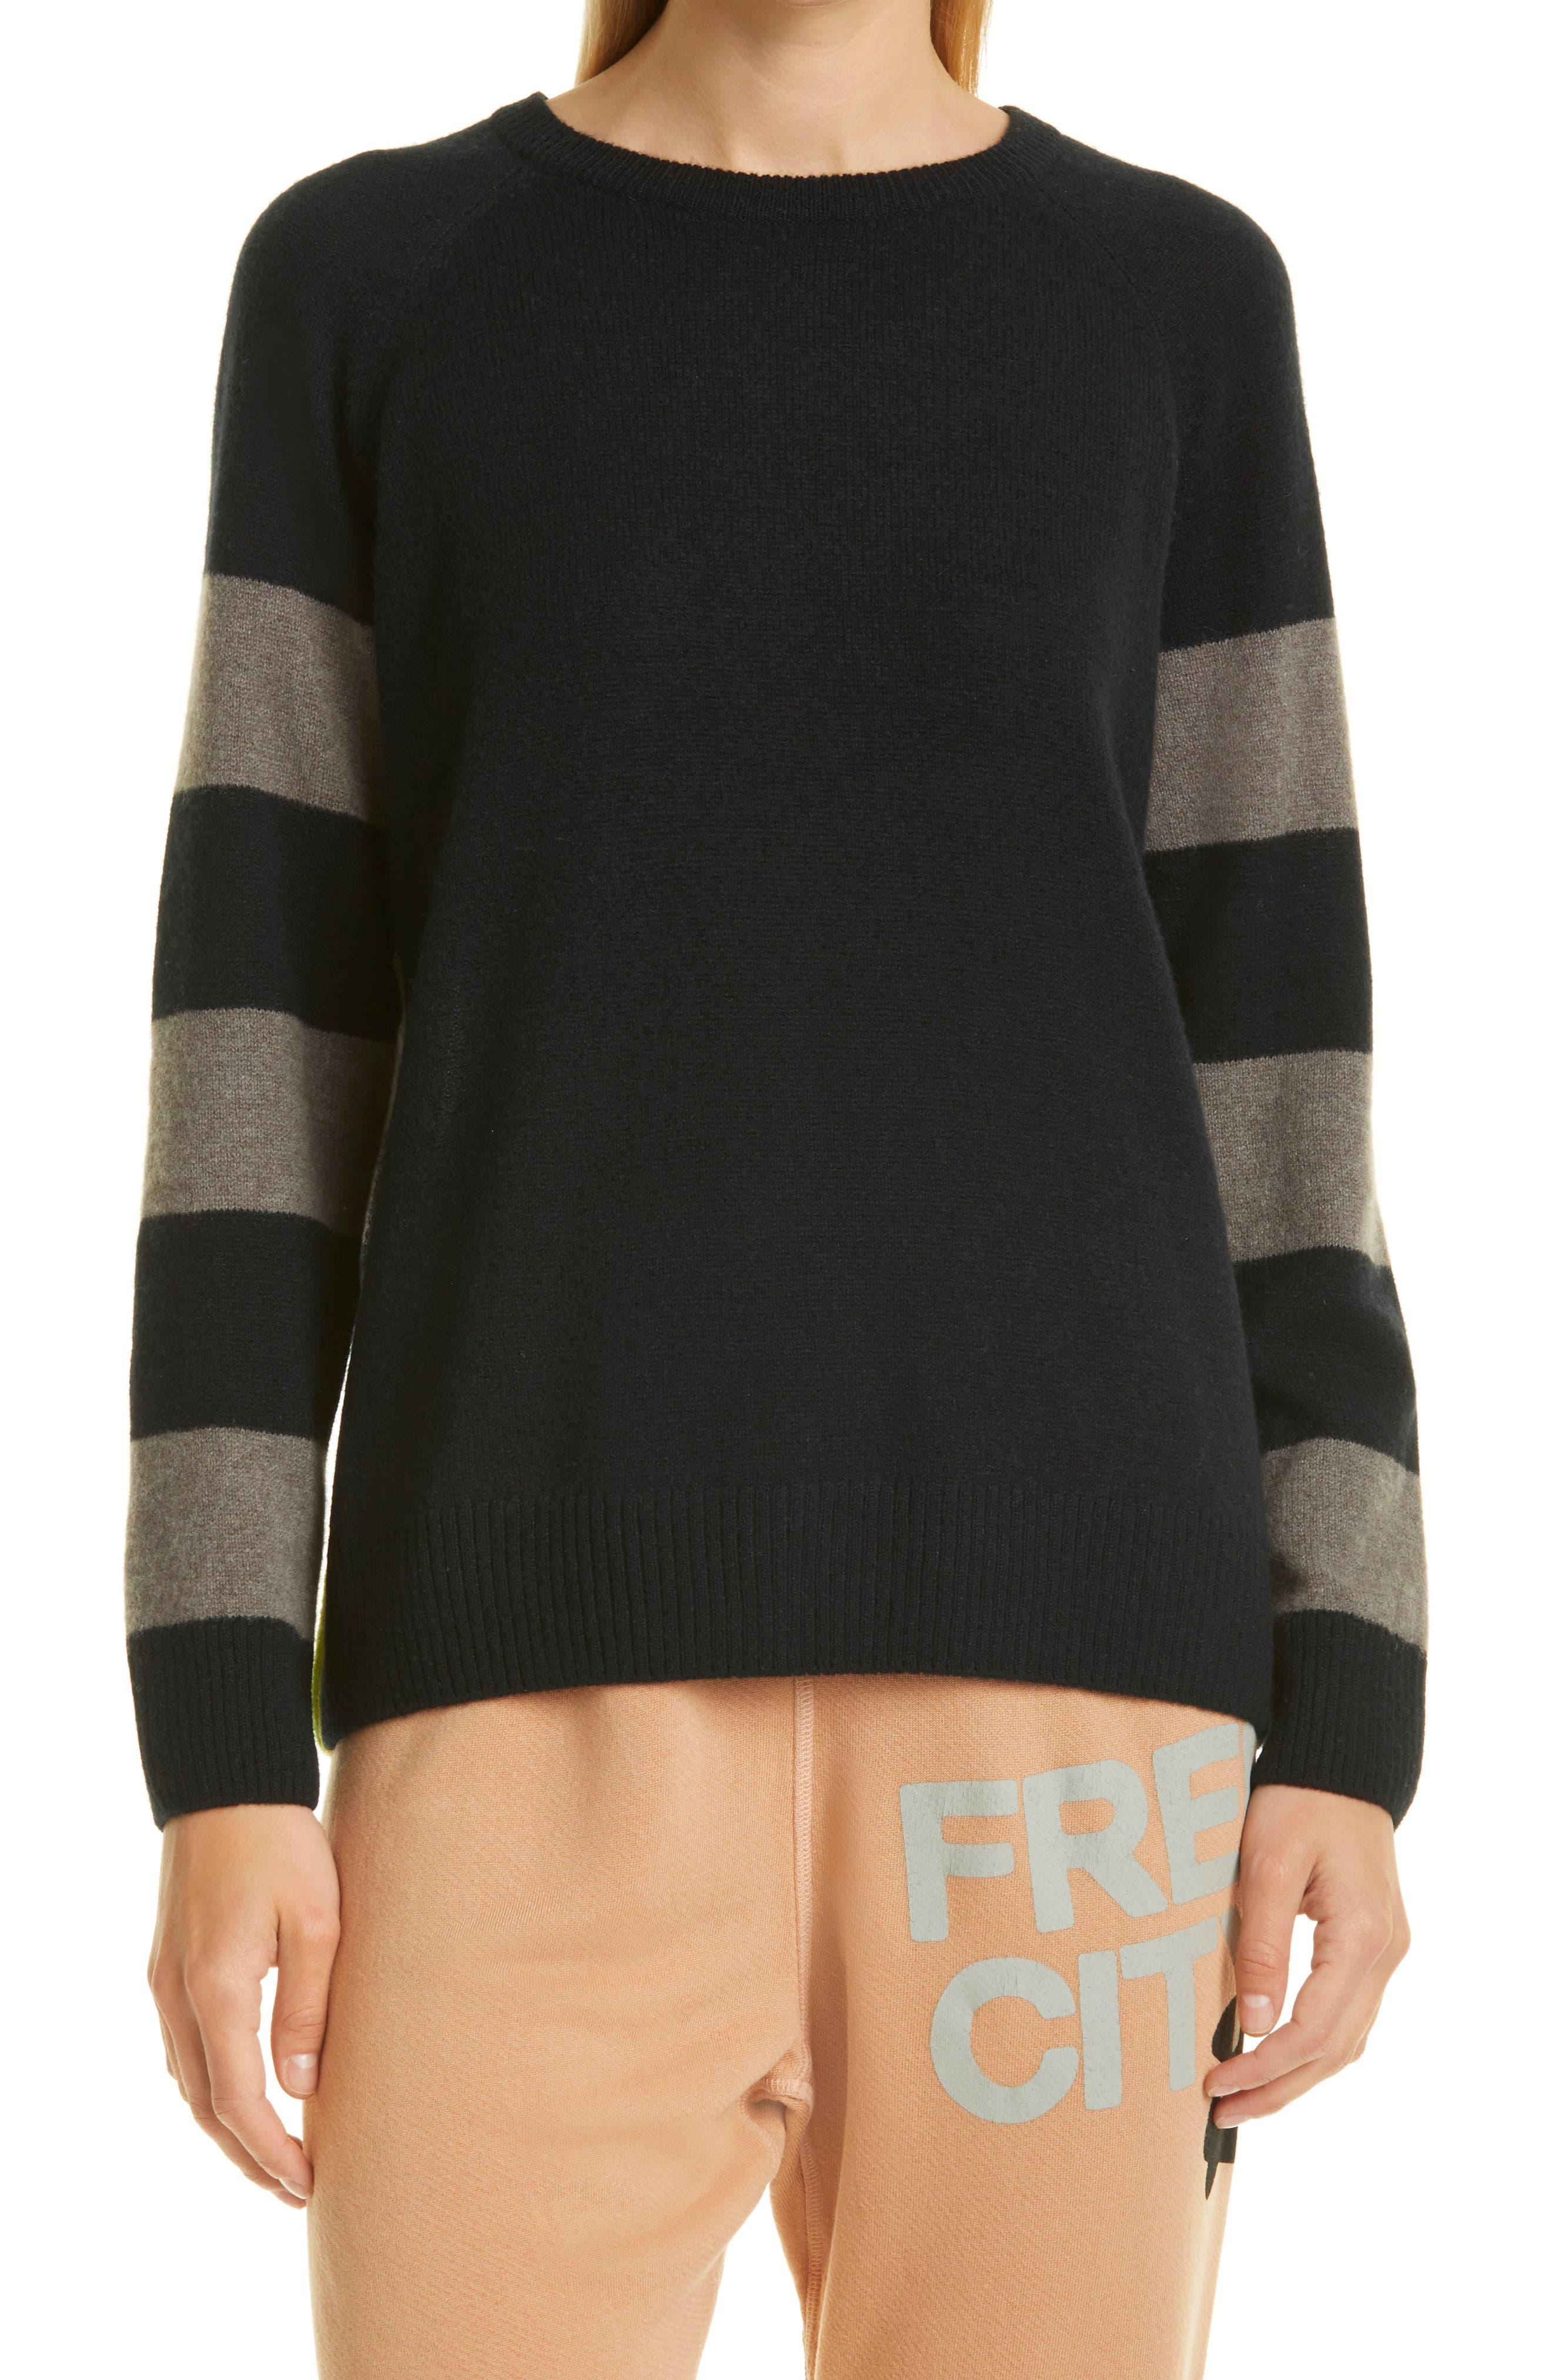 Featherweight Rabbitstrikes Superluxe Cashmere Sweater